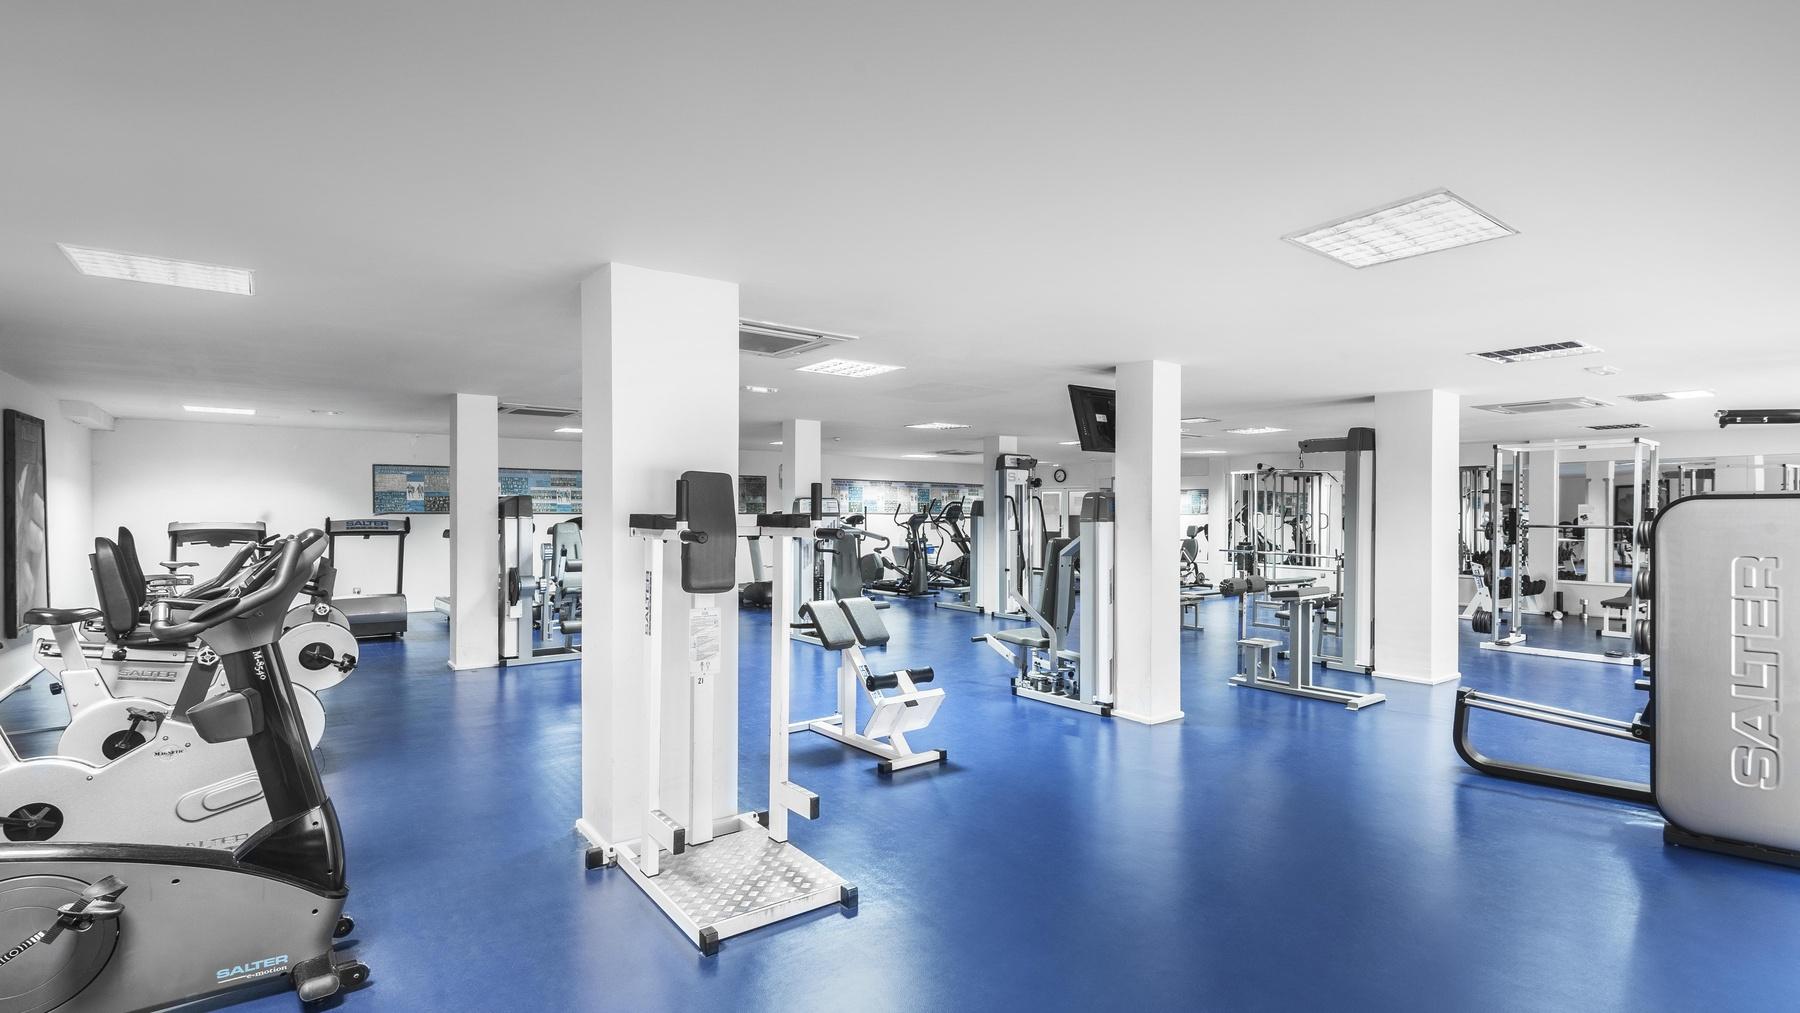 Club Fitness Gym | Suite Hotel Fuerteventura Resort